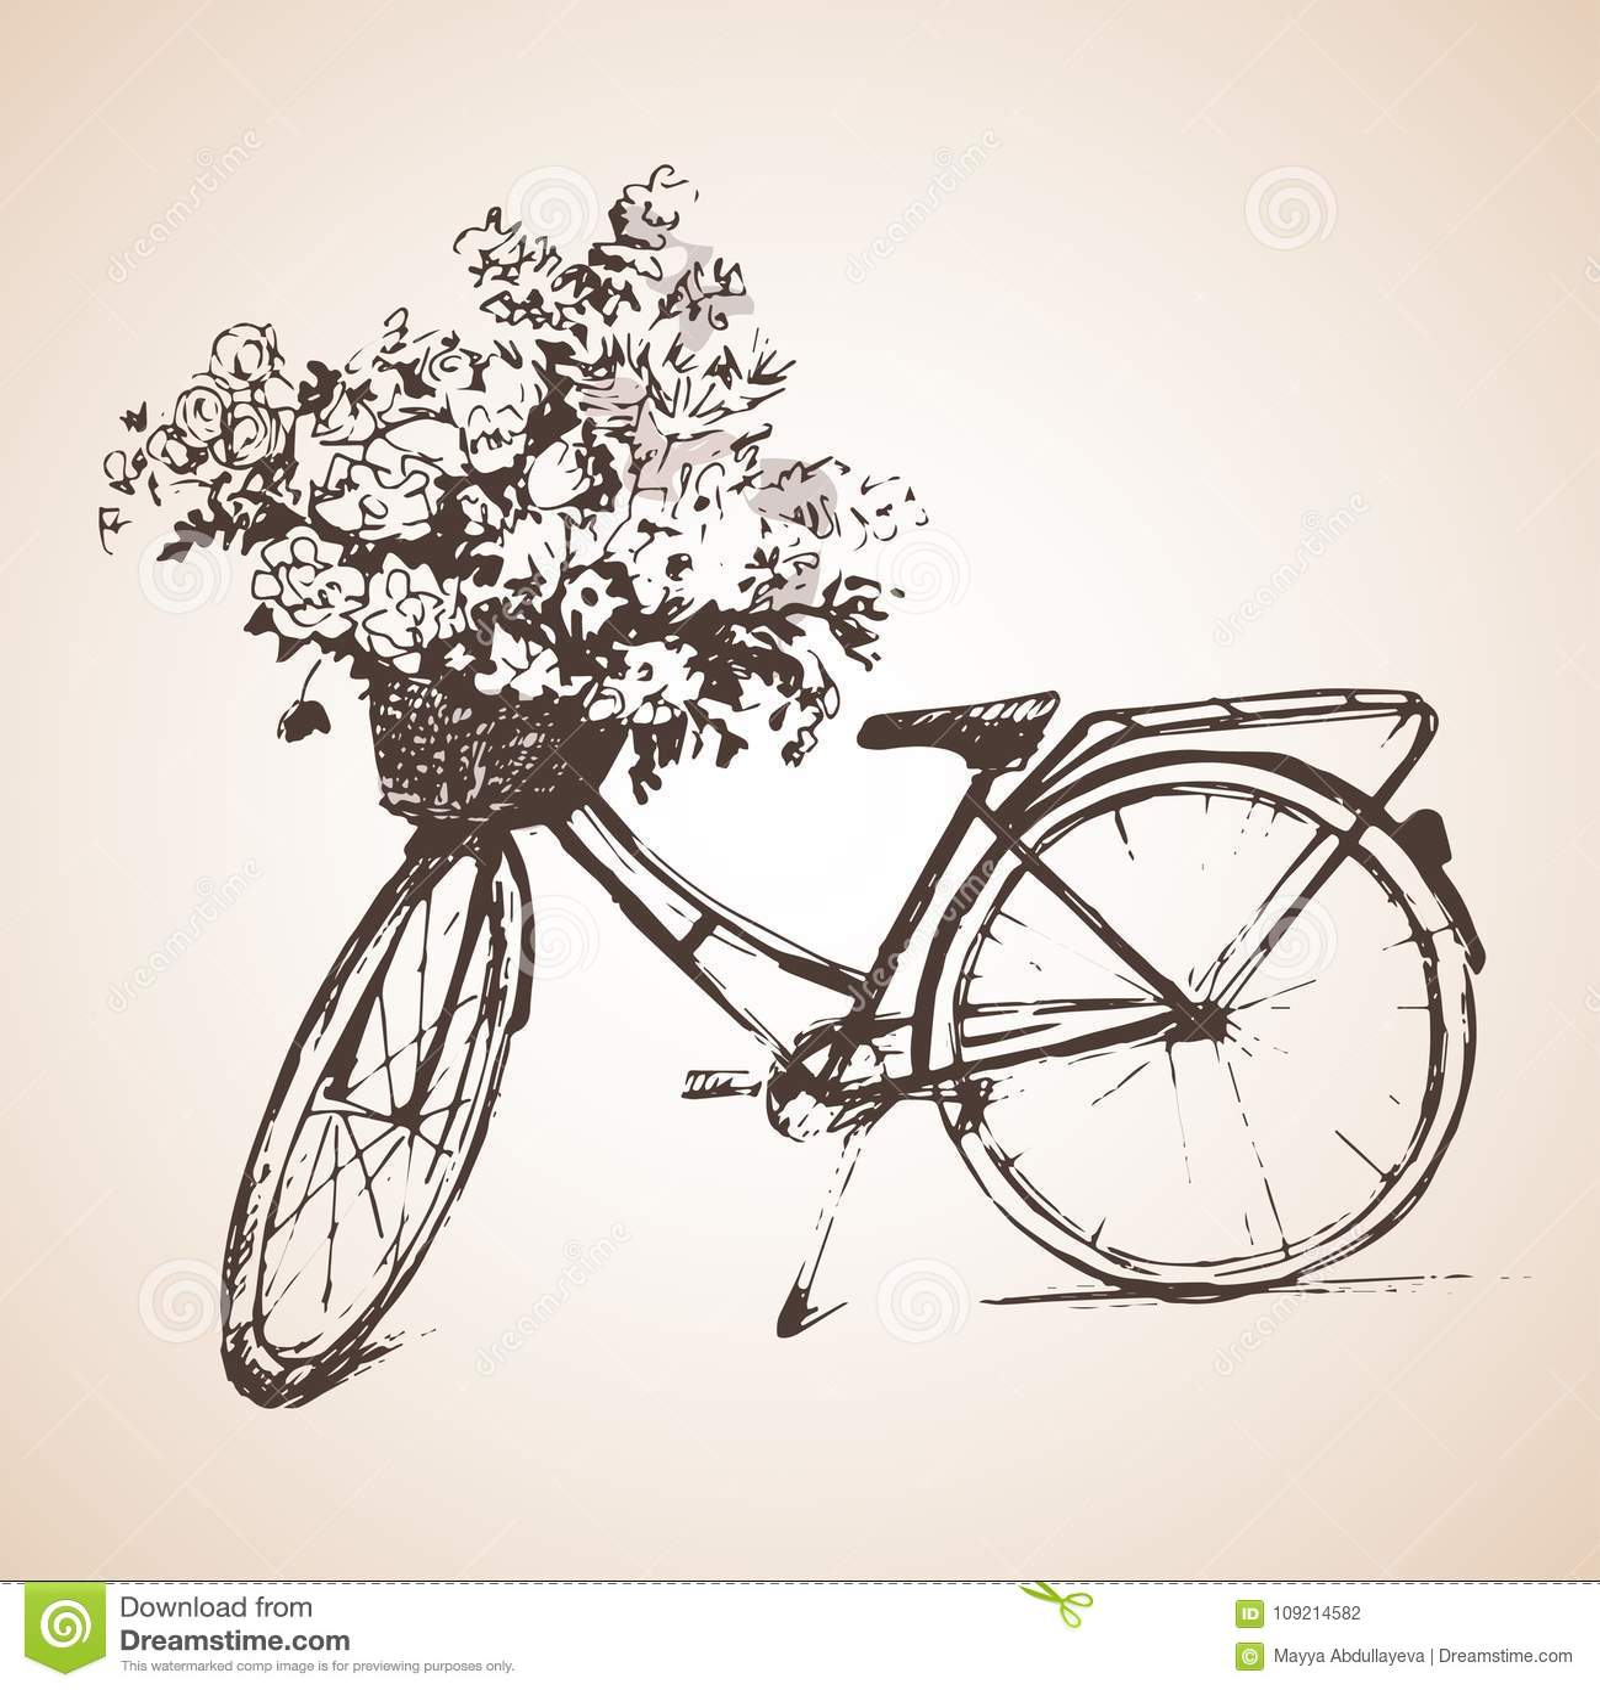 Bike with big bunch of flowers. Sketch.